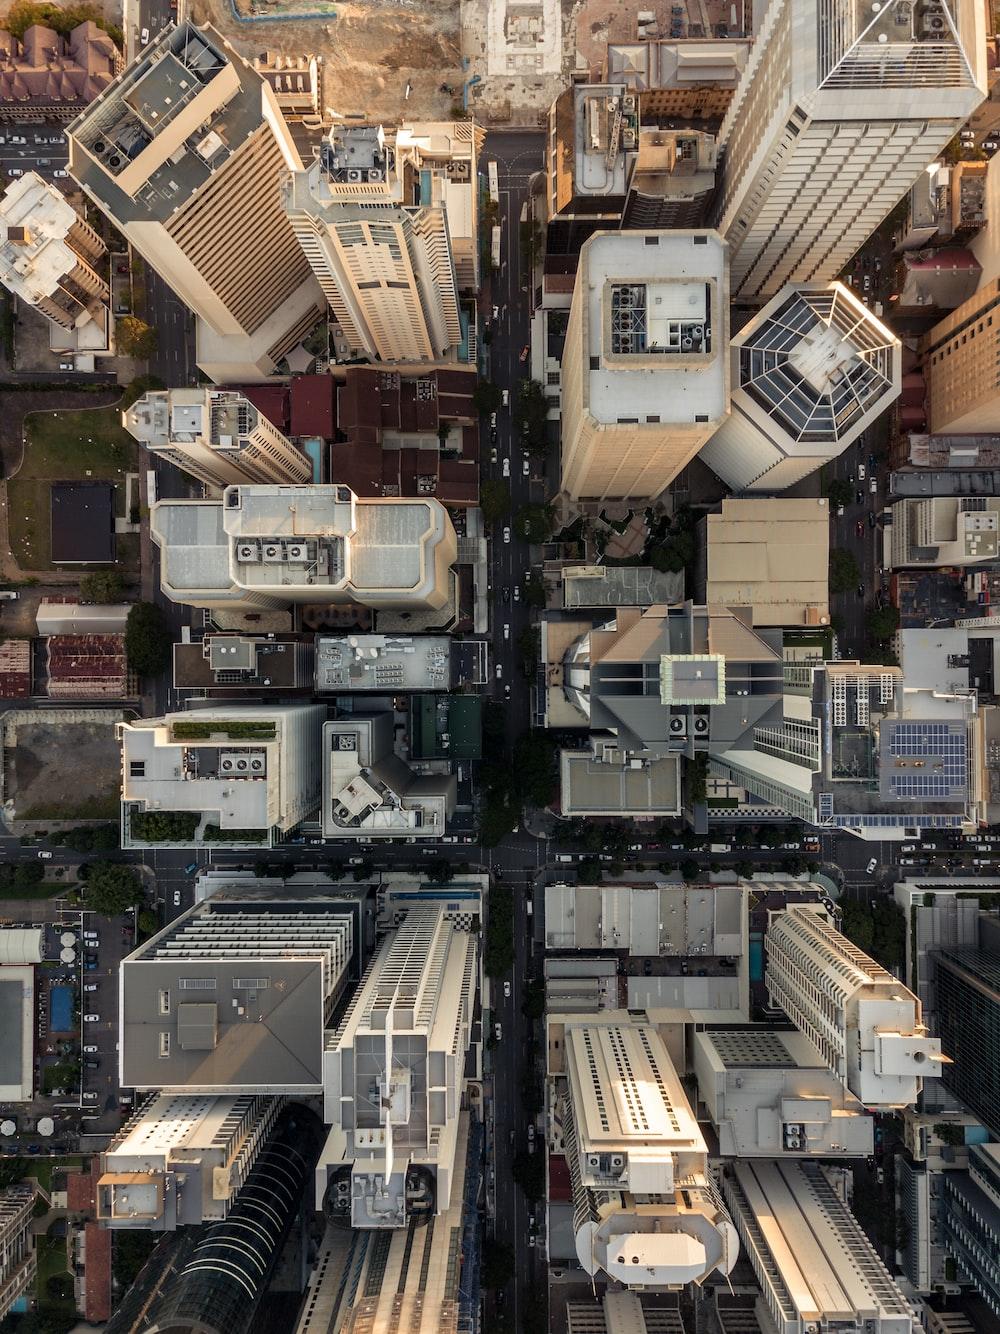 bird's eye view of buildings